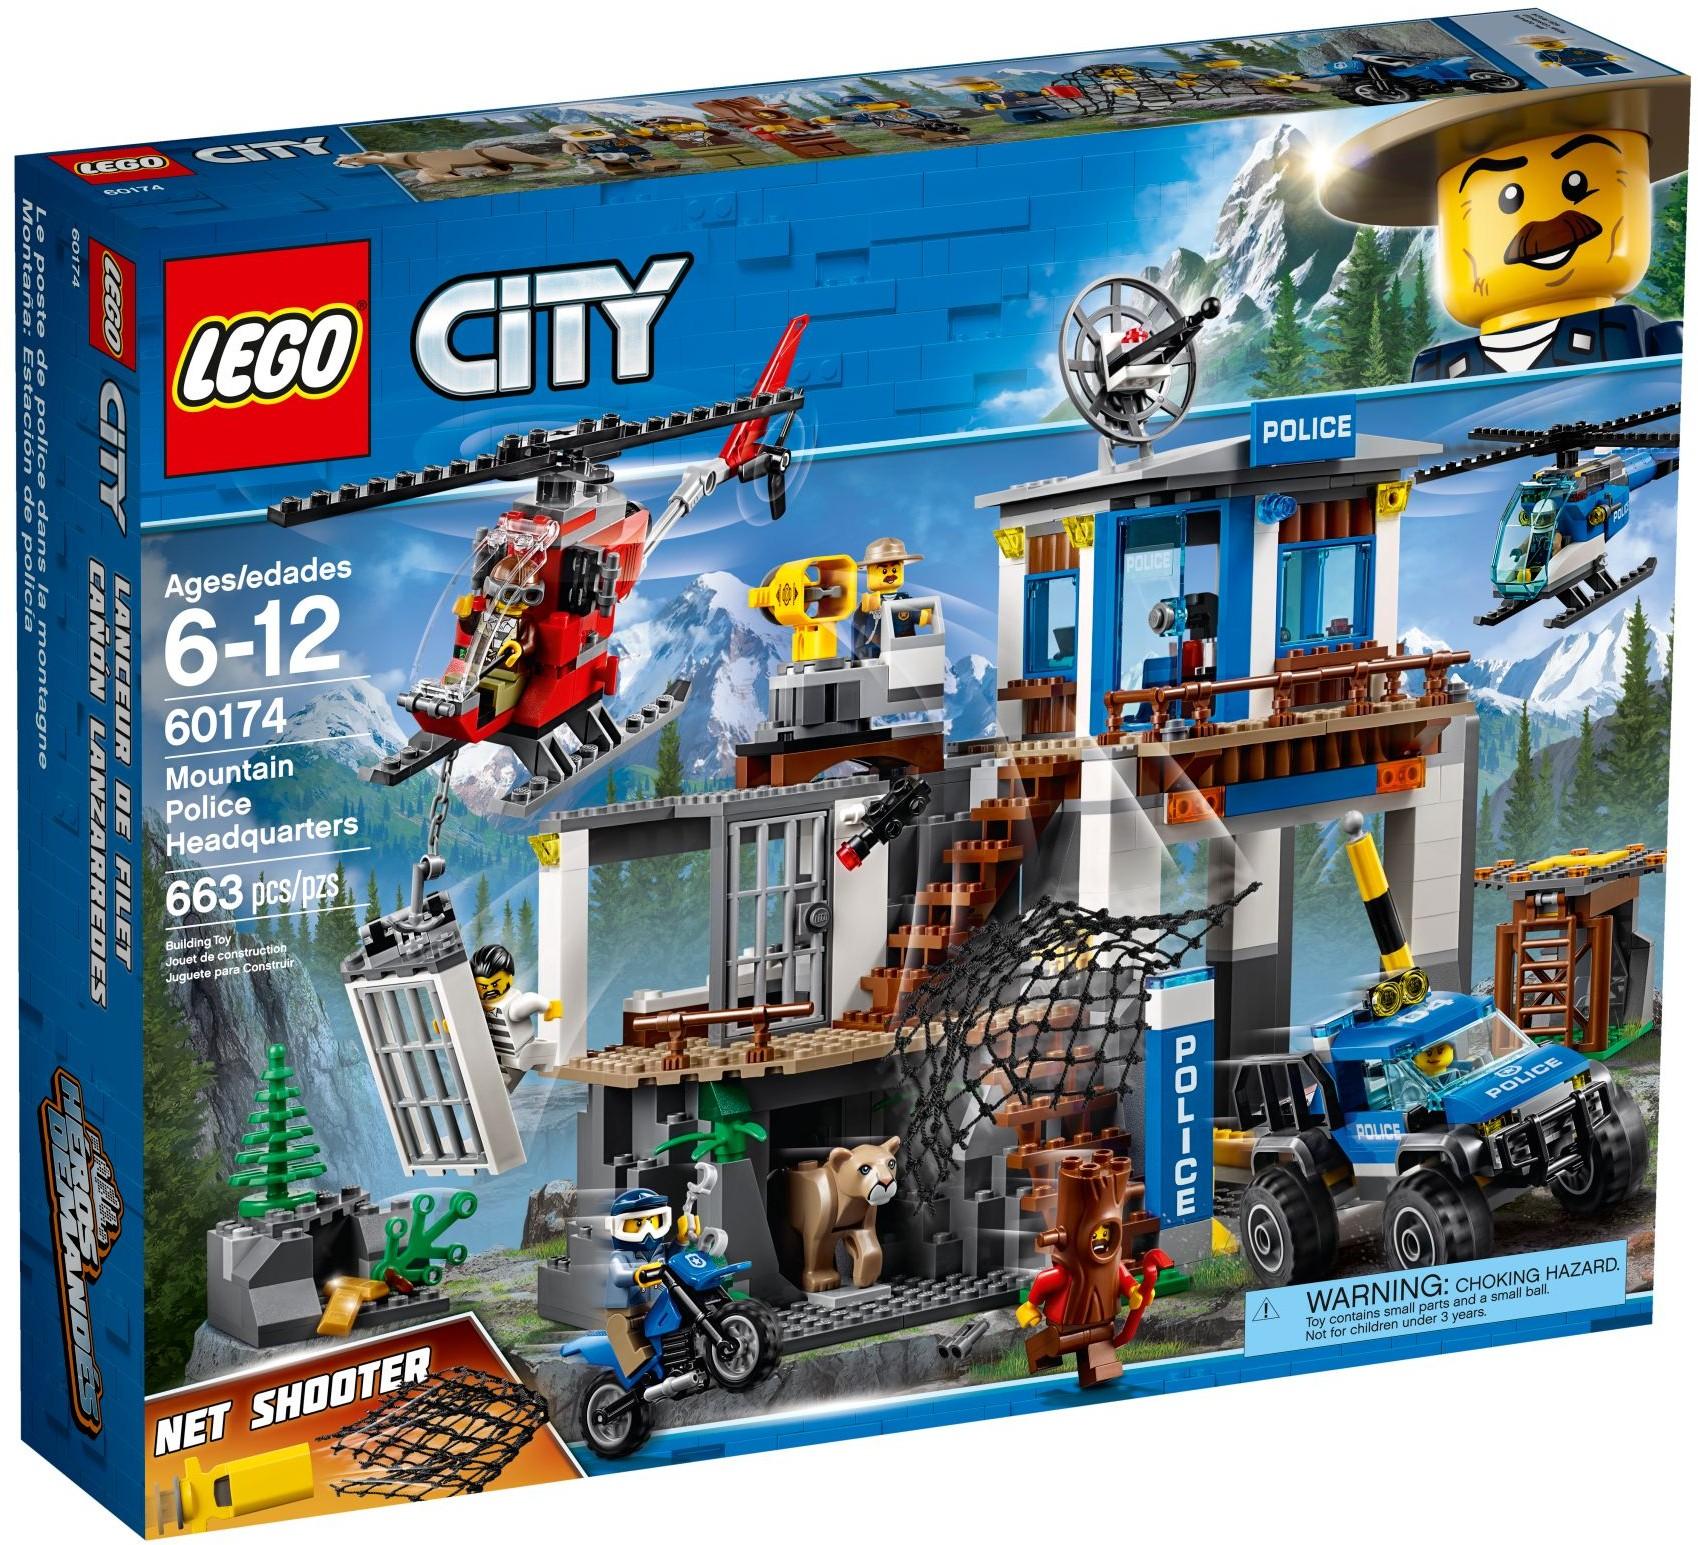 Klocki Lego City Górski Posterunek Policji 60174 7112188365